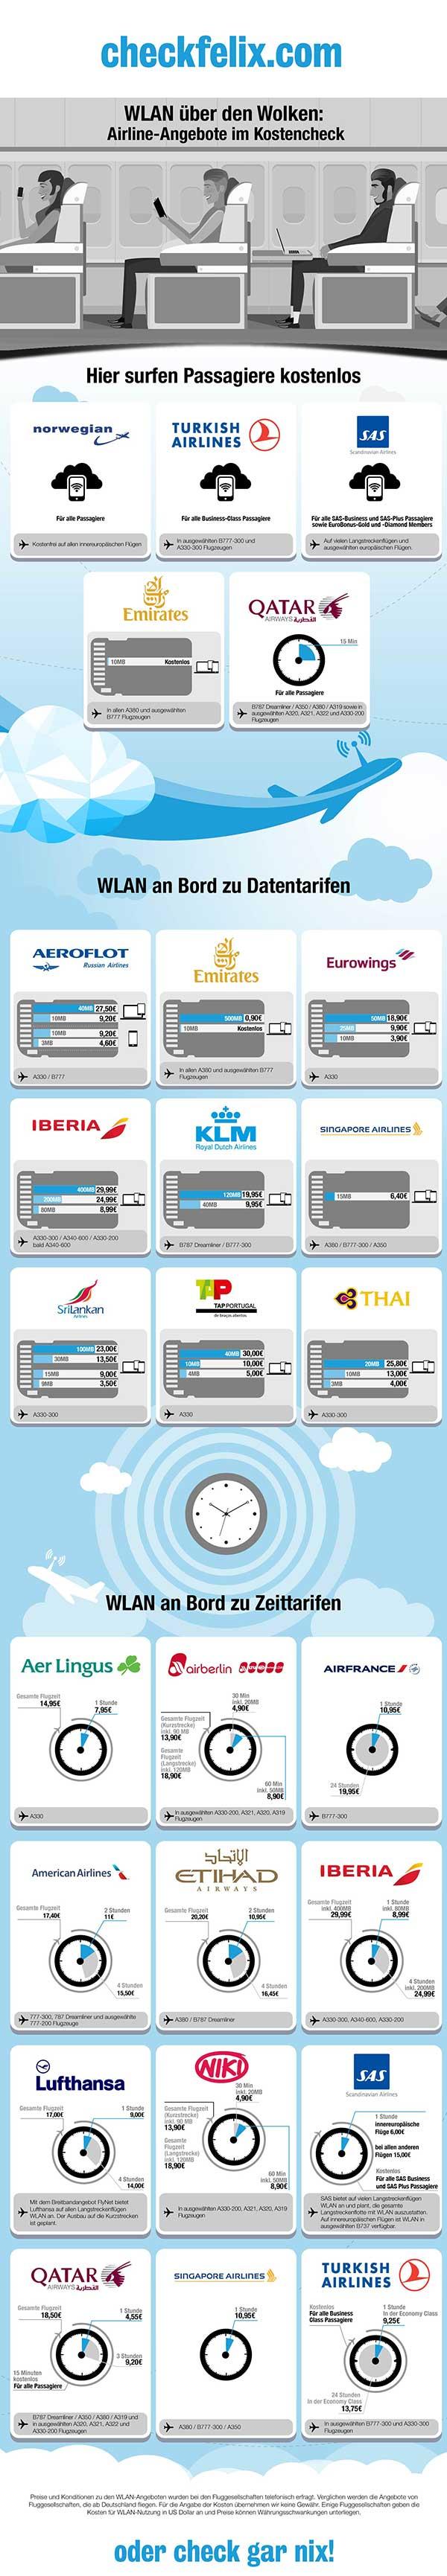 checkfelix_Infografik_WiFi_Kosten_AT_SD_2